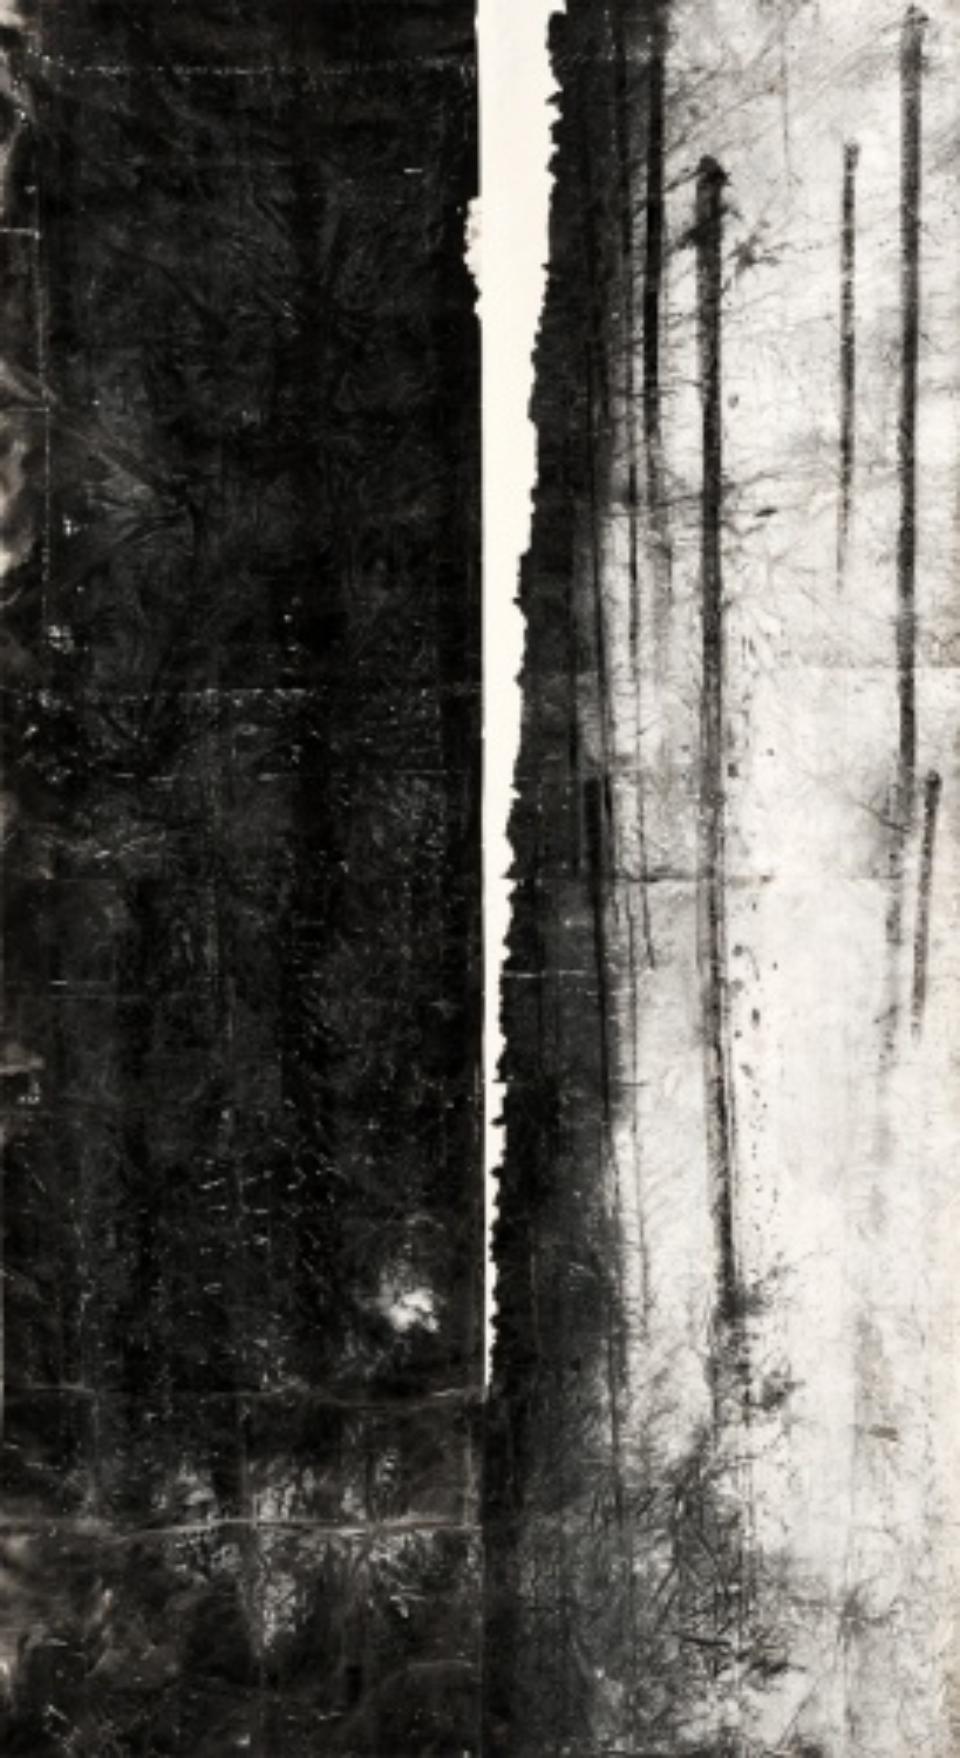 Zheng Chongbin: Slanted light 2011 Ink, acrylics and wash on xuan paper L 190 cm x H 390 cm